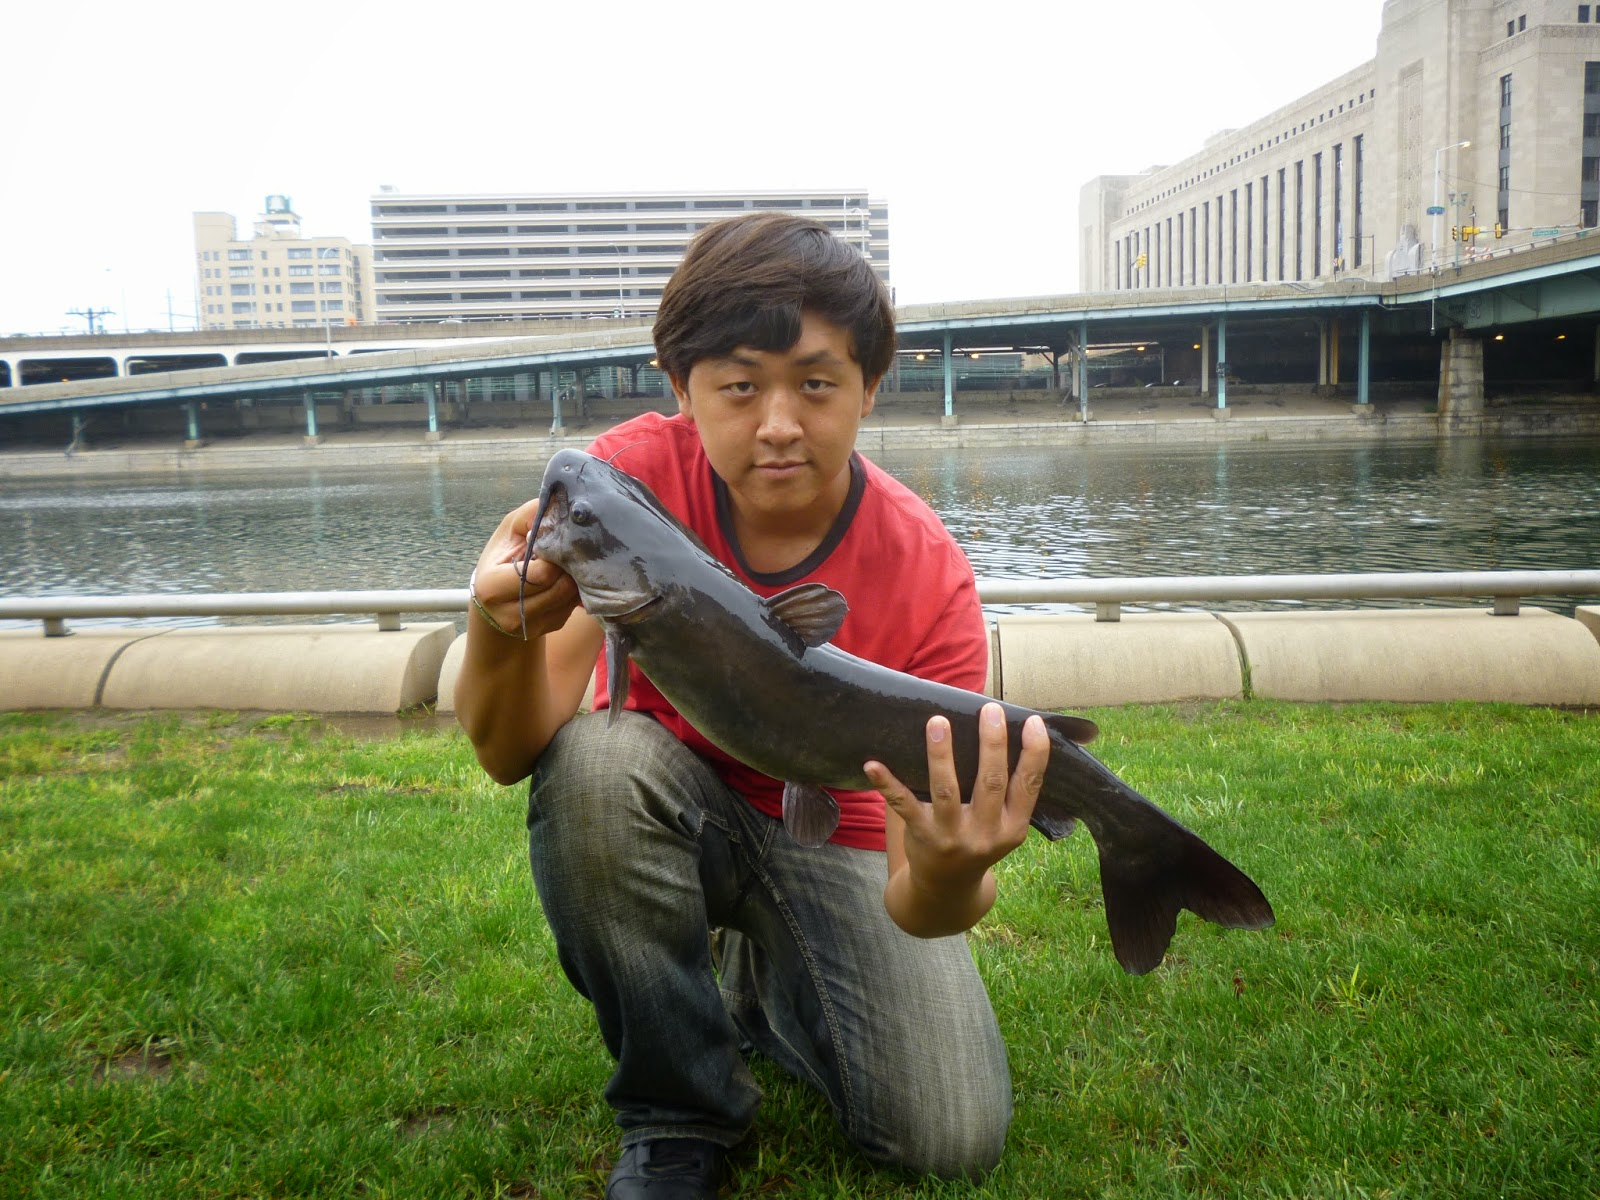 Extreme philly fishing 6th catfish tourney on the banks for Extreme philly fishing